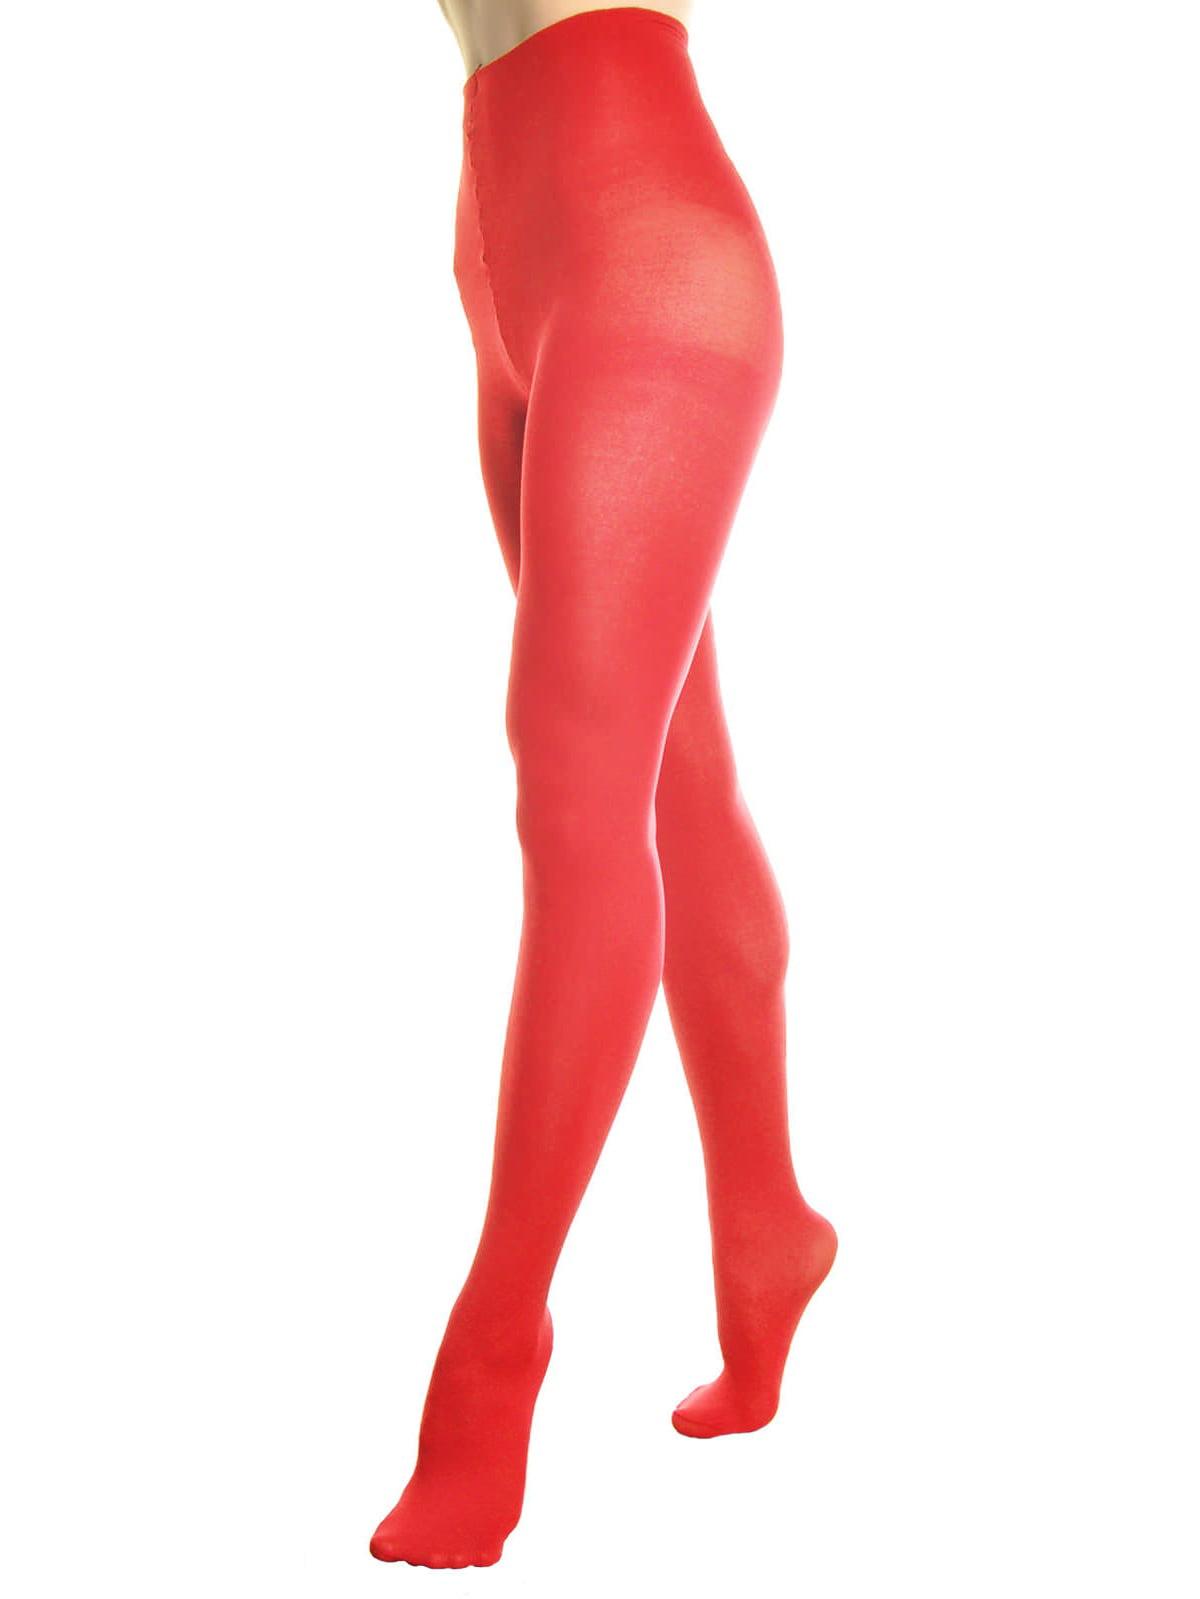 Hanes Raisin//Dark Red Control Top Tights Matte Opaque 0B406 MSRP $12